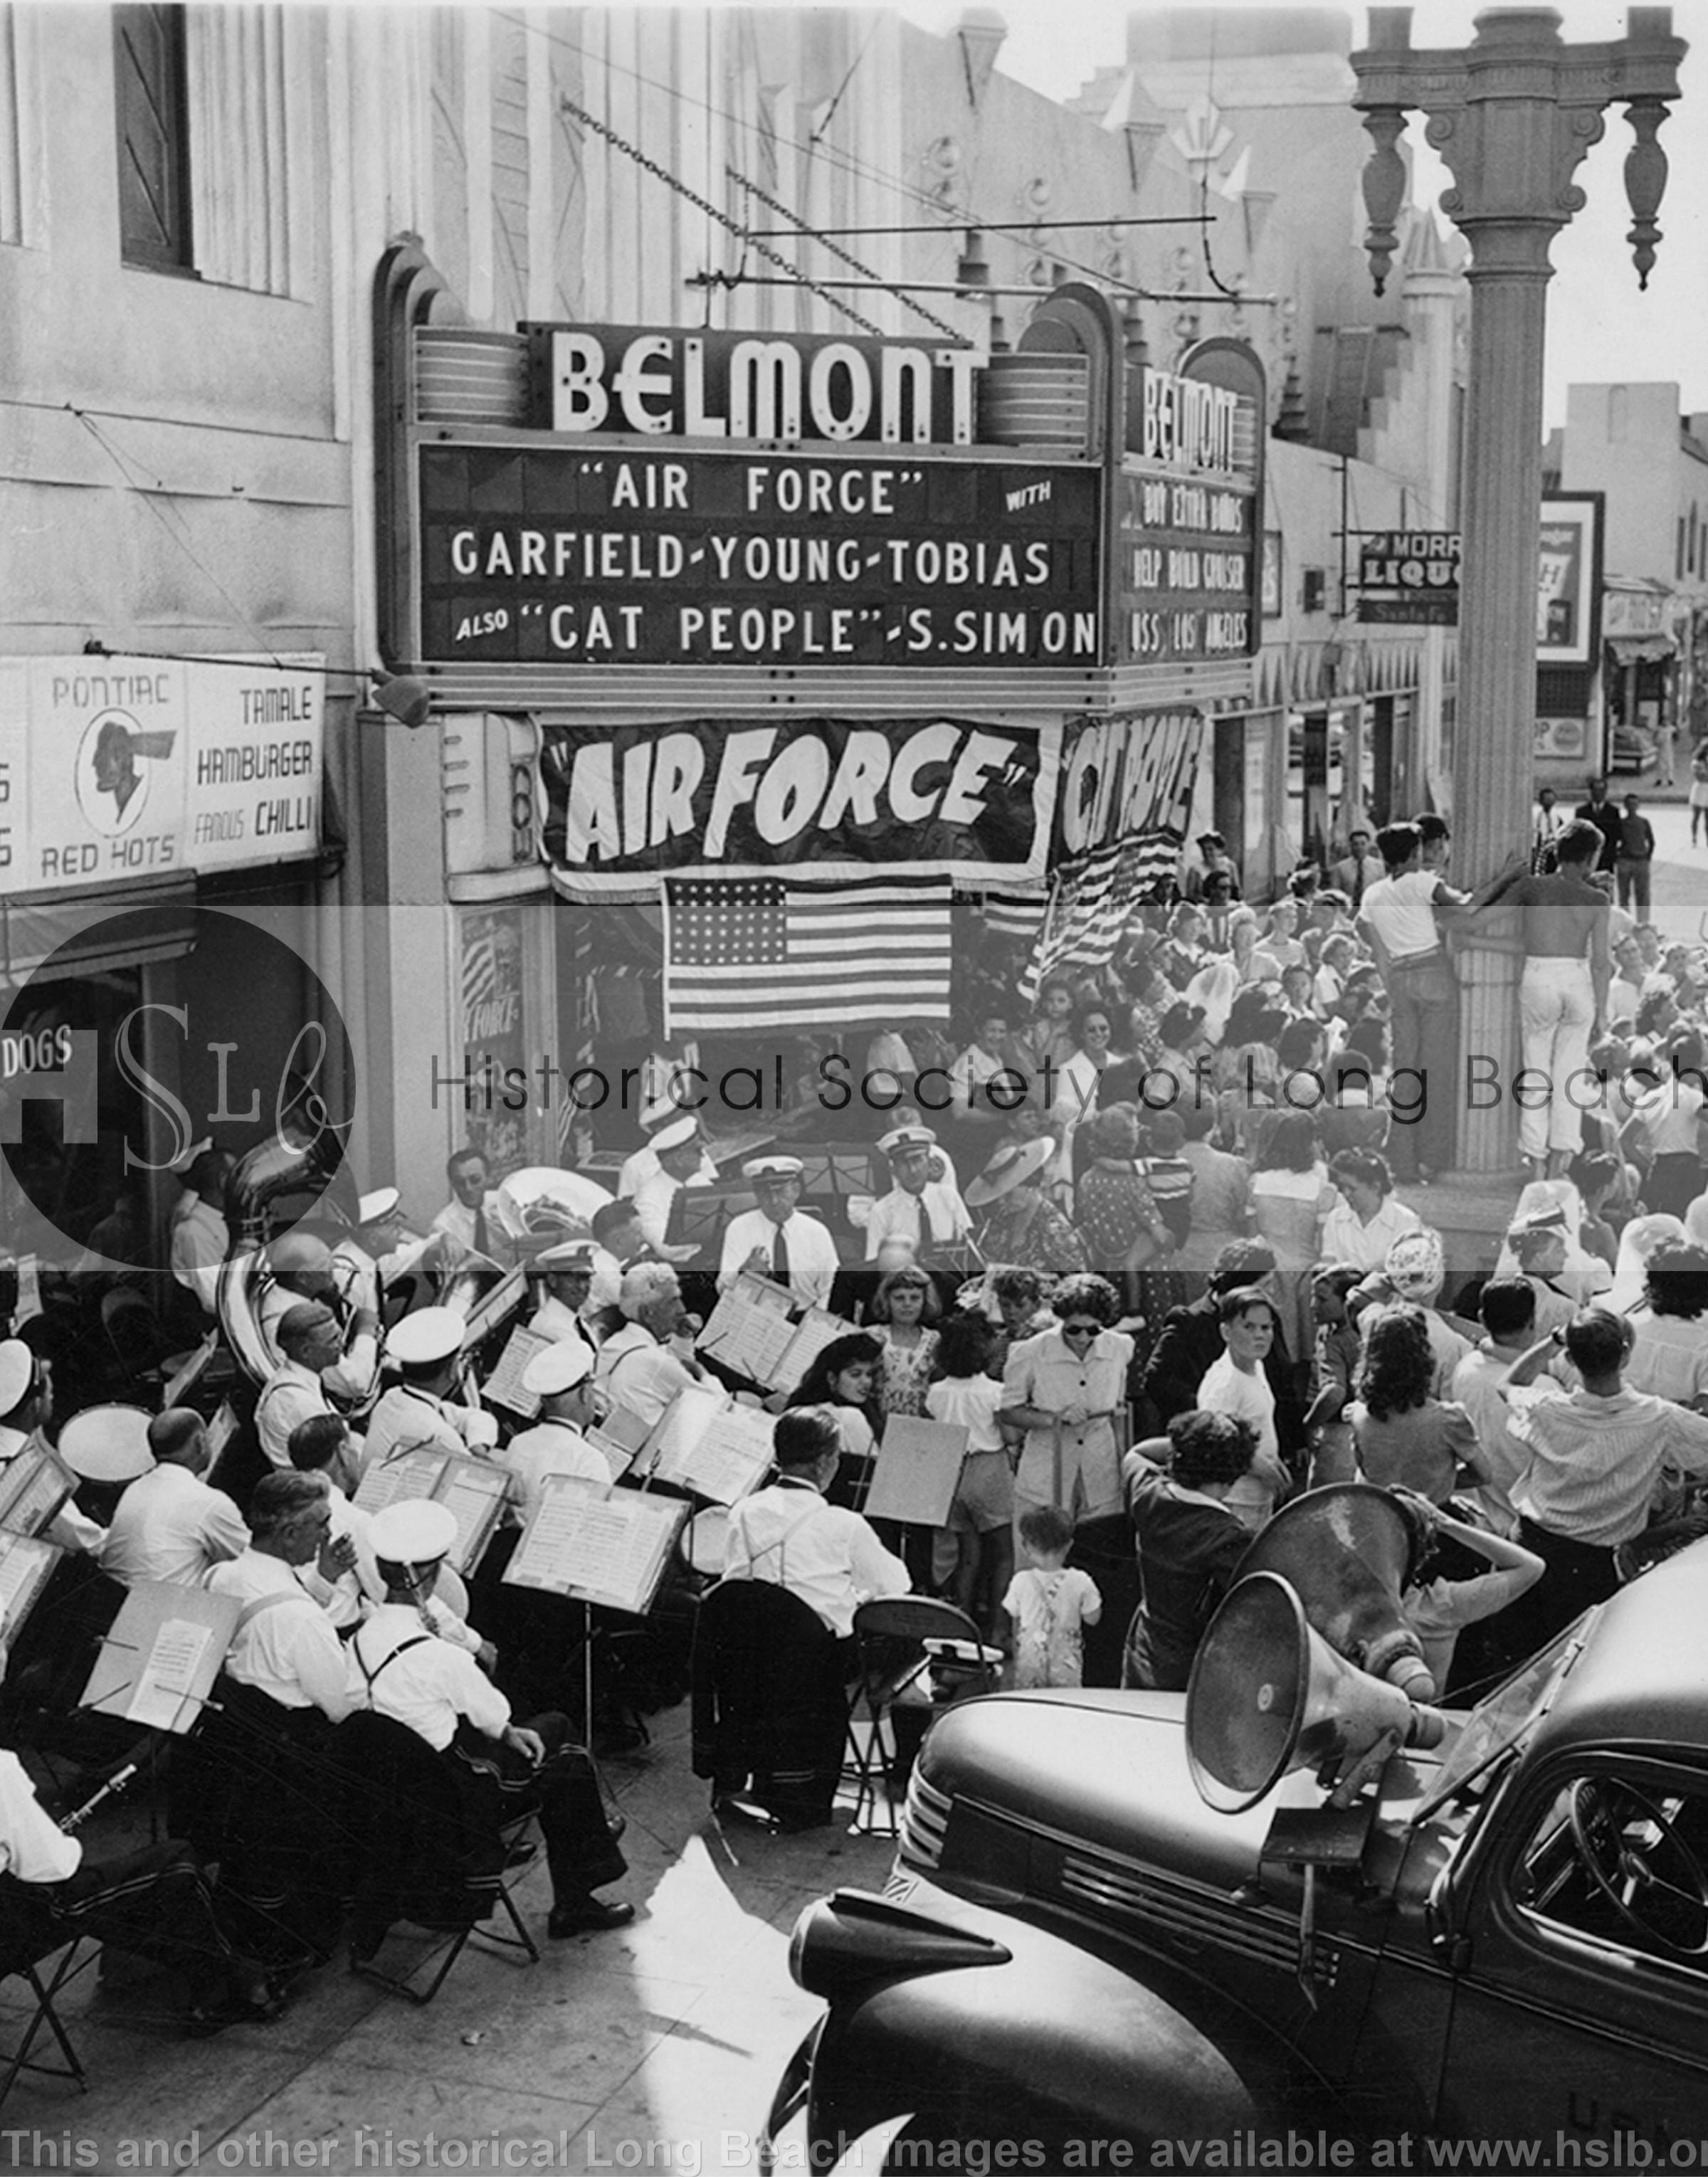 Belmont Theatre band, 1943